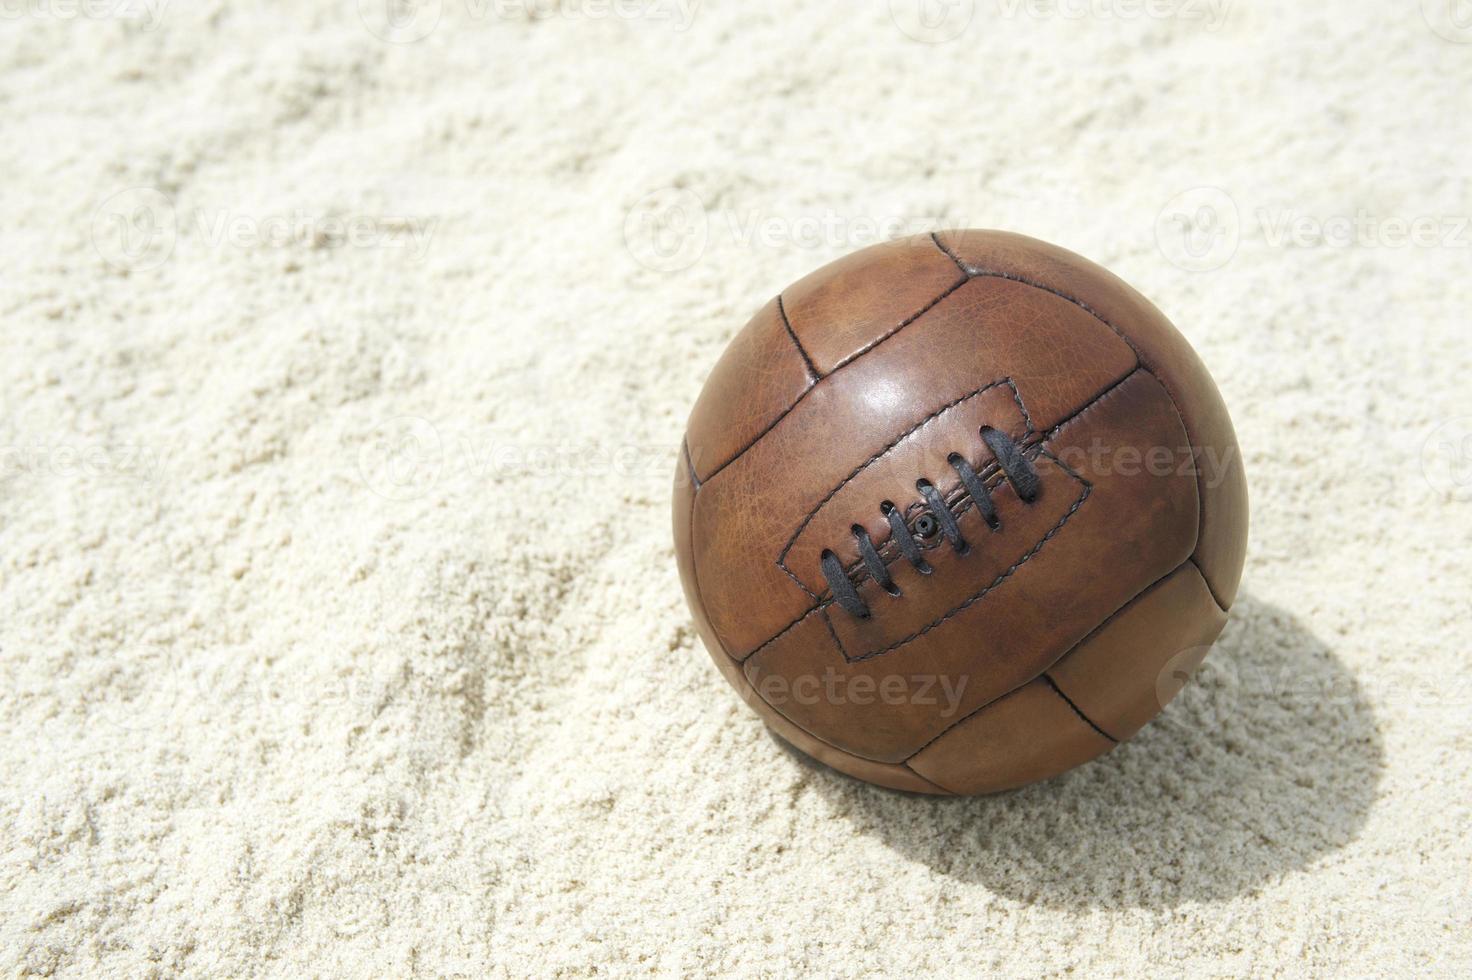 vintage bruine voetbal voetbal zandstrand achtergrond foto